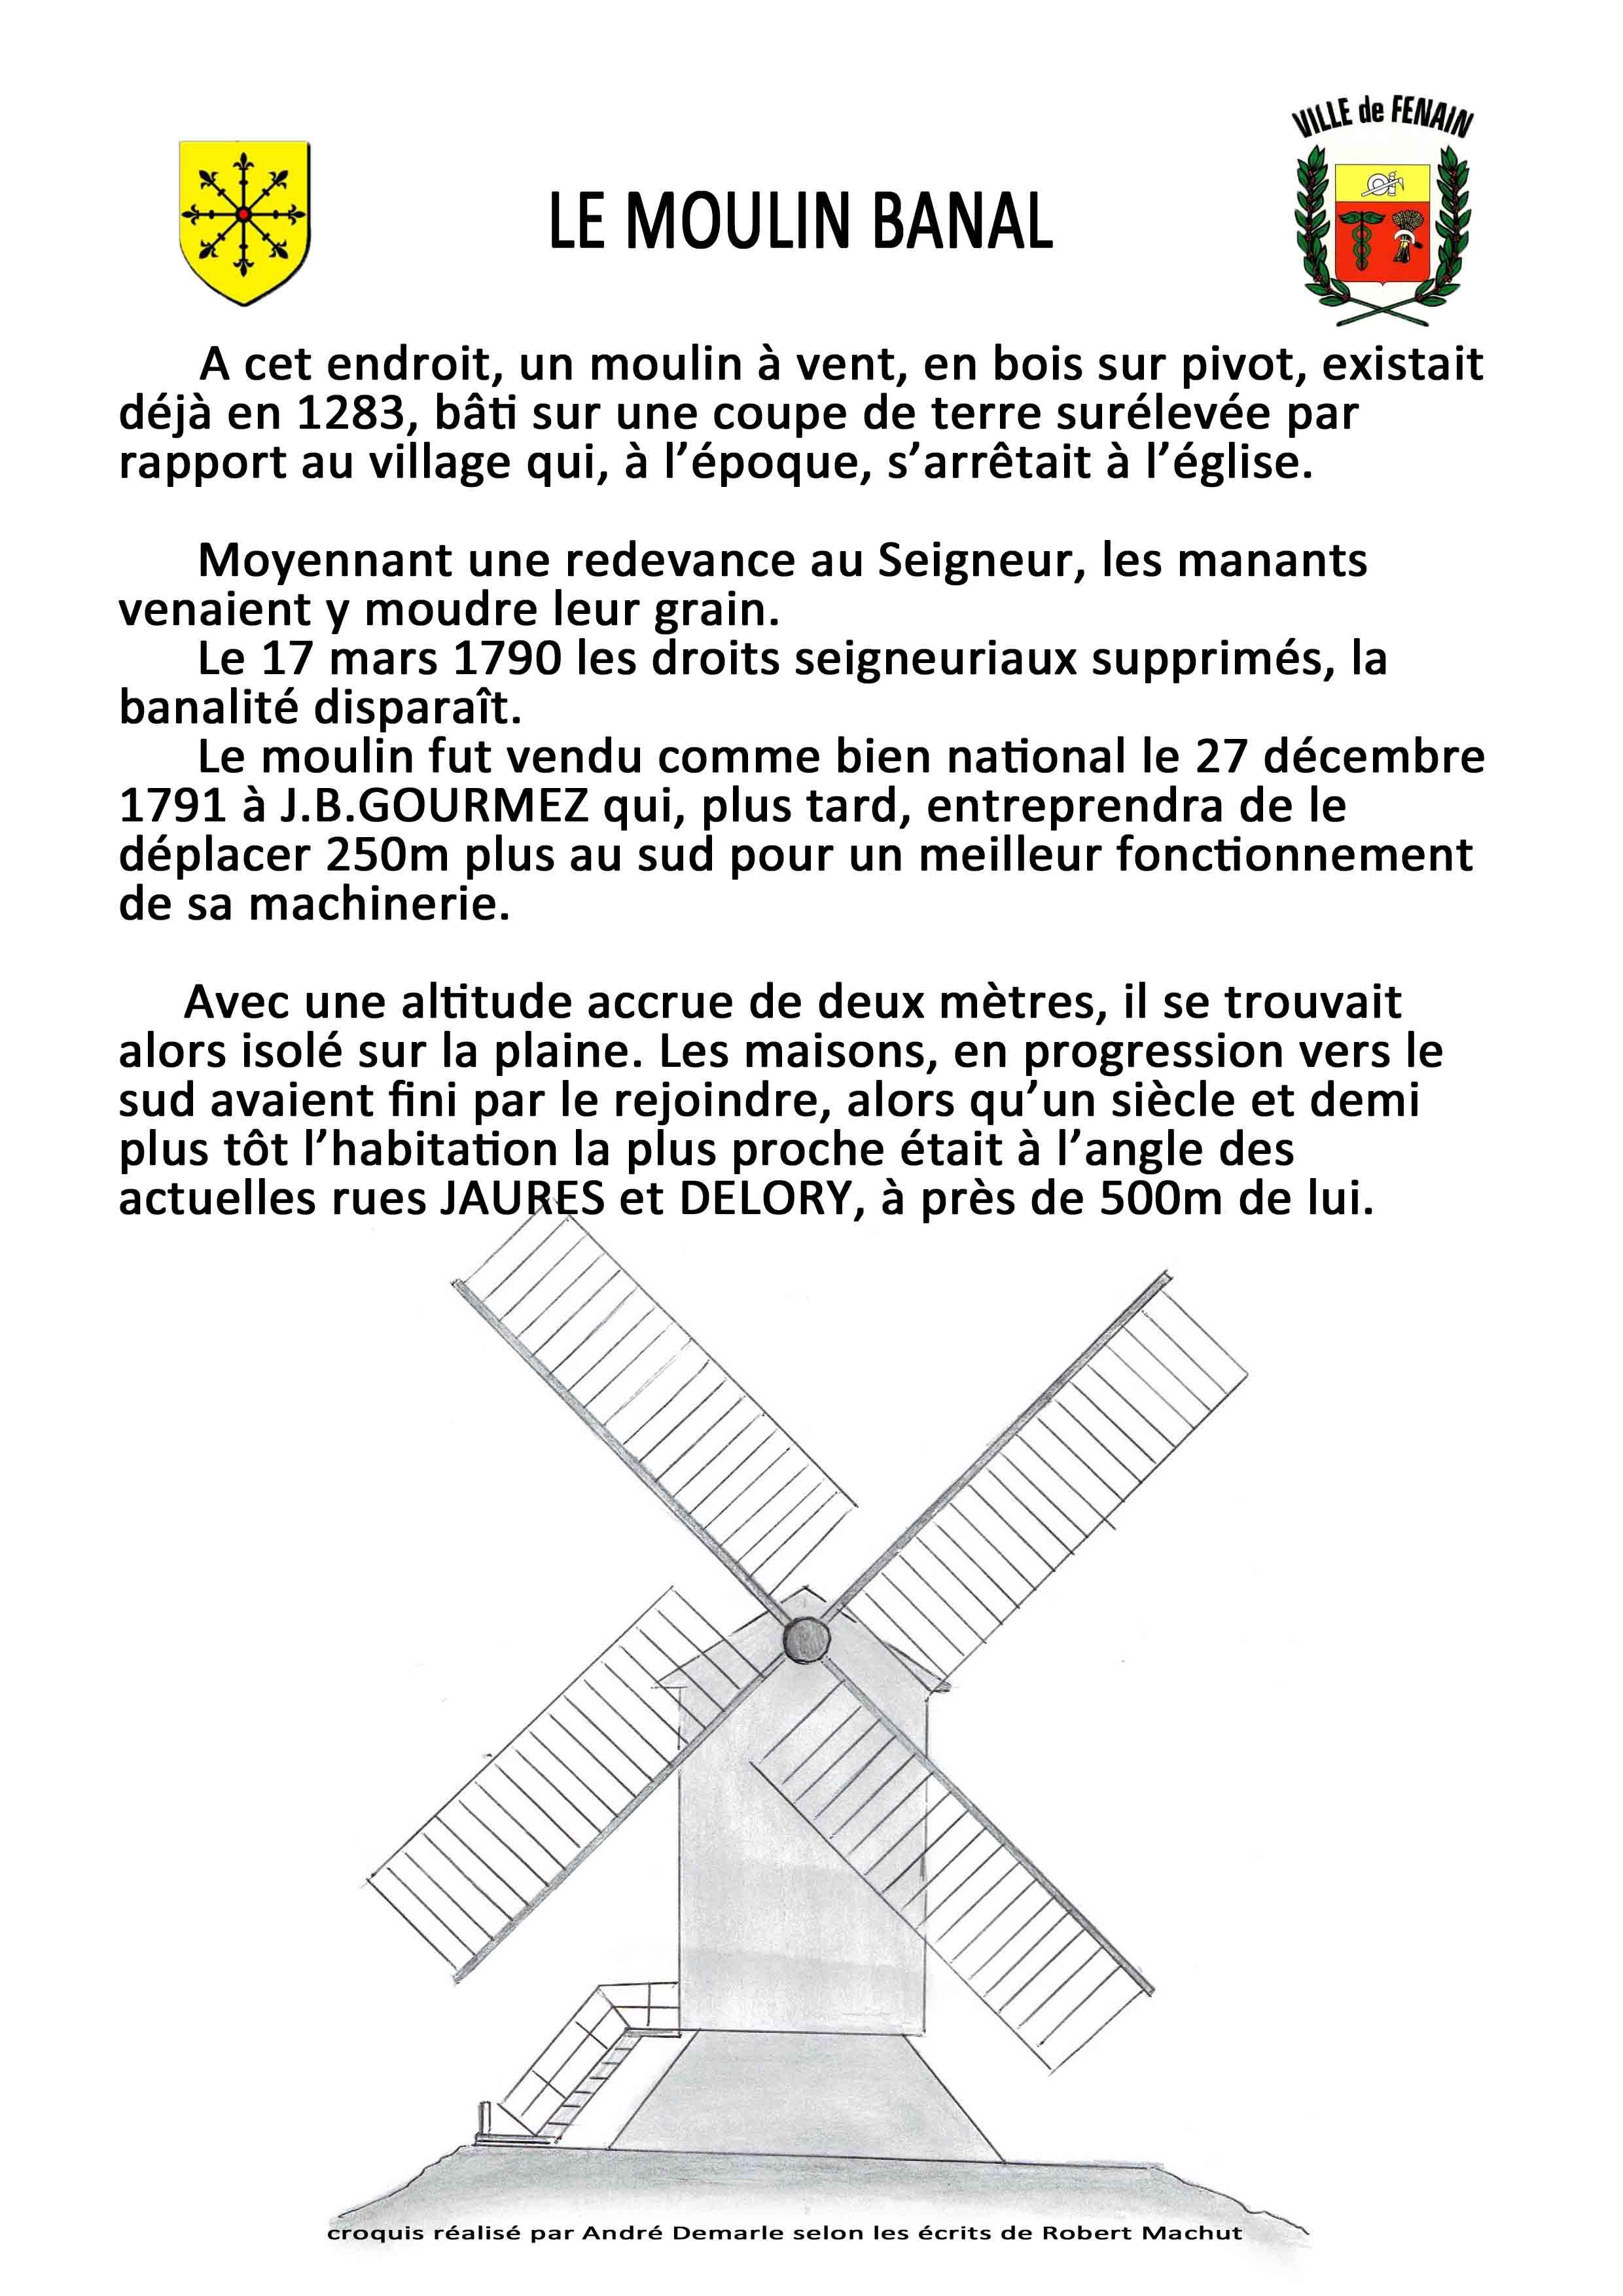 moulin-banal-_1_.jpg